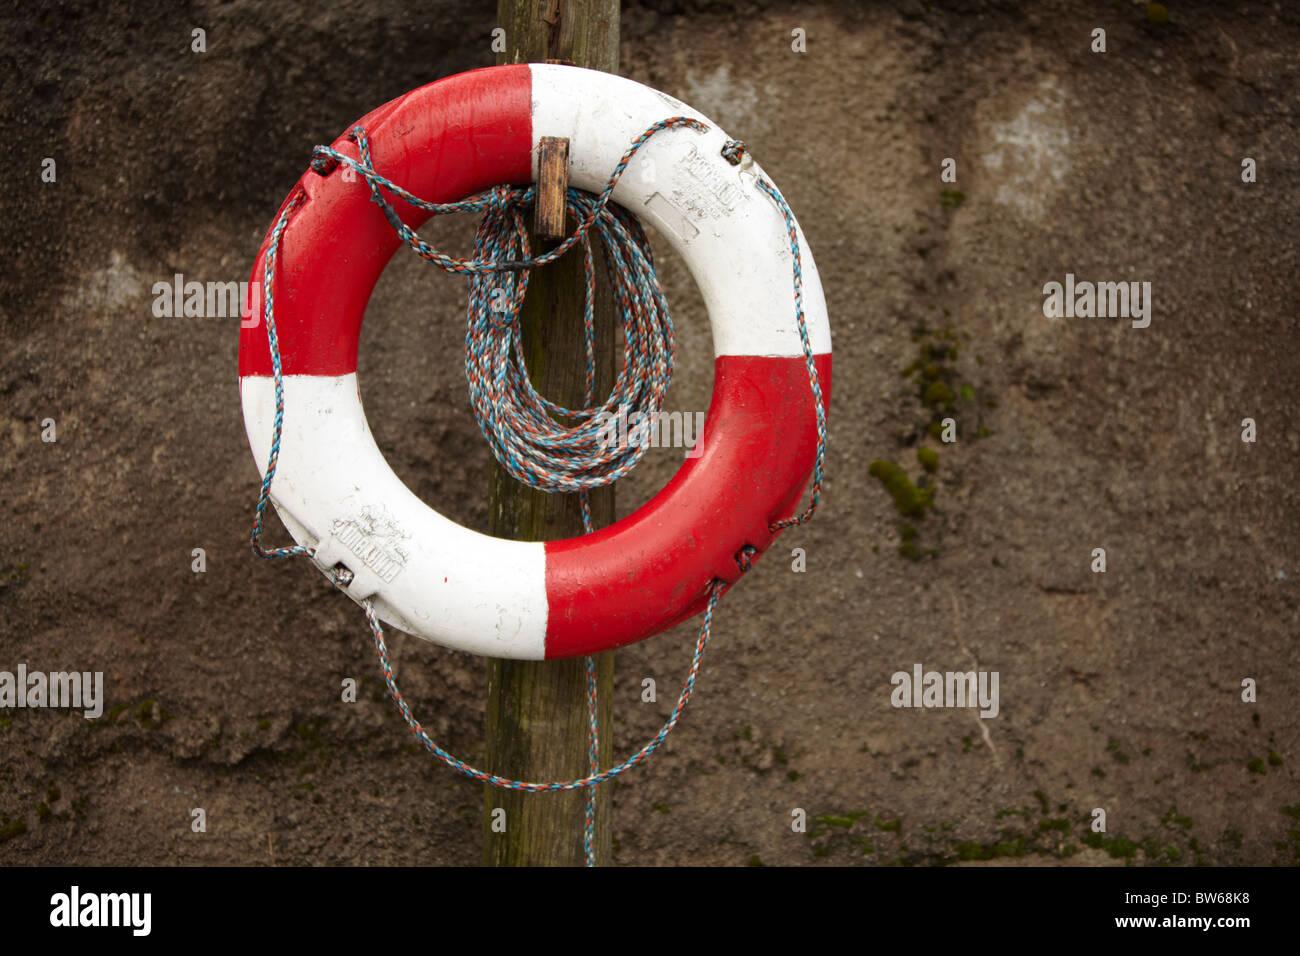 Life saver ring landscape format - Stock Image